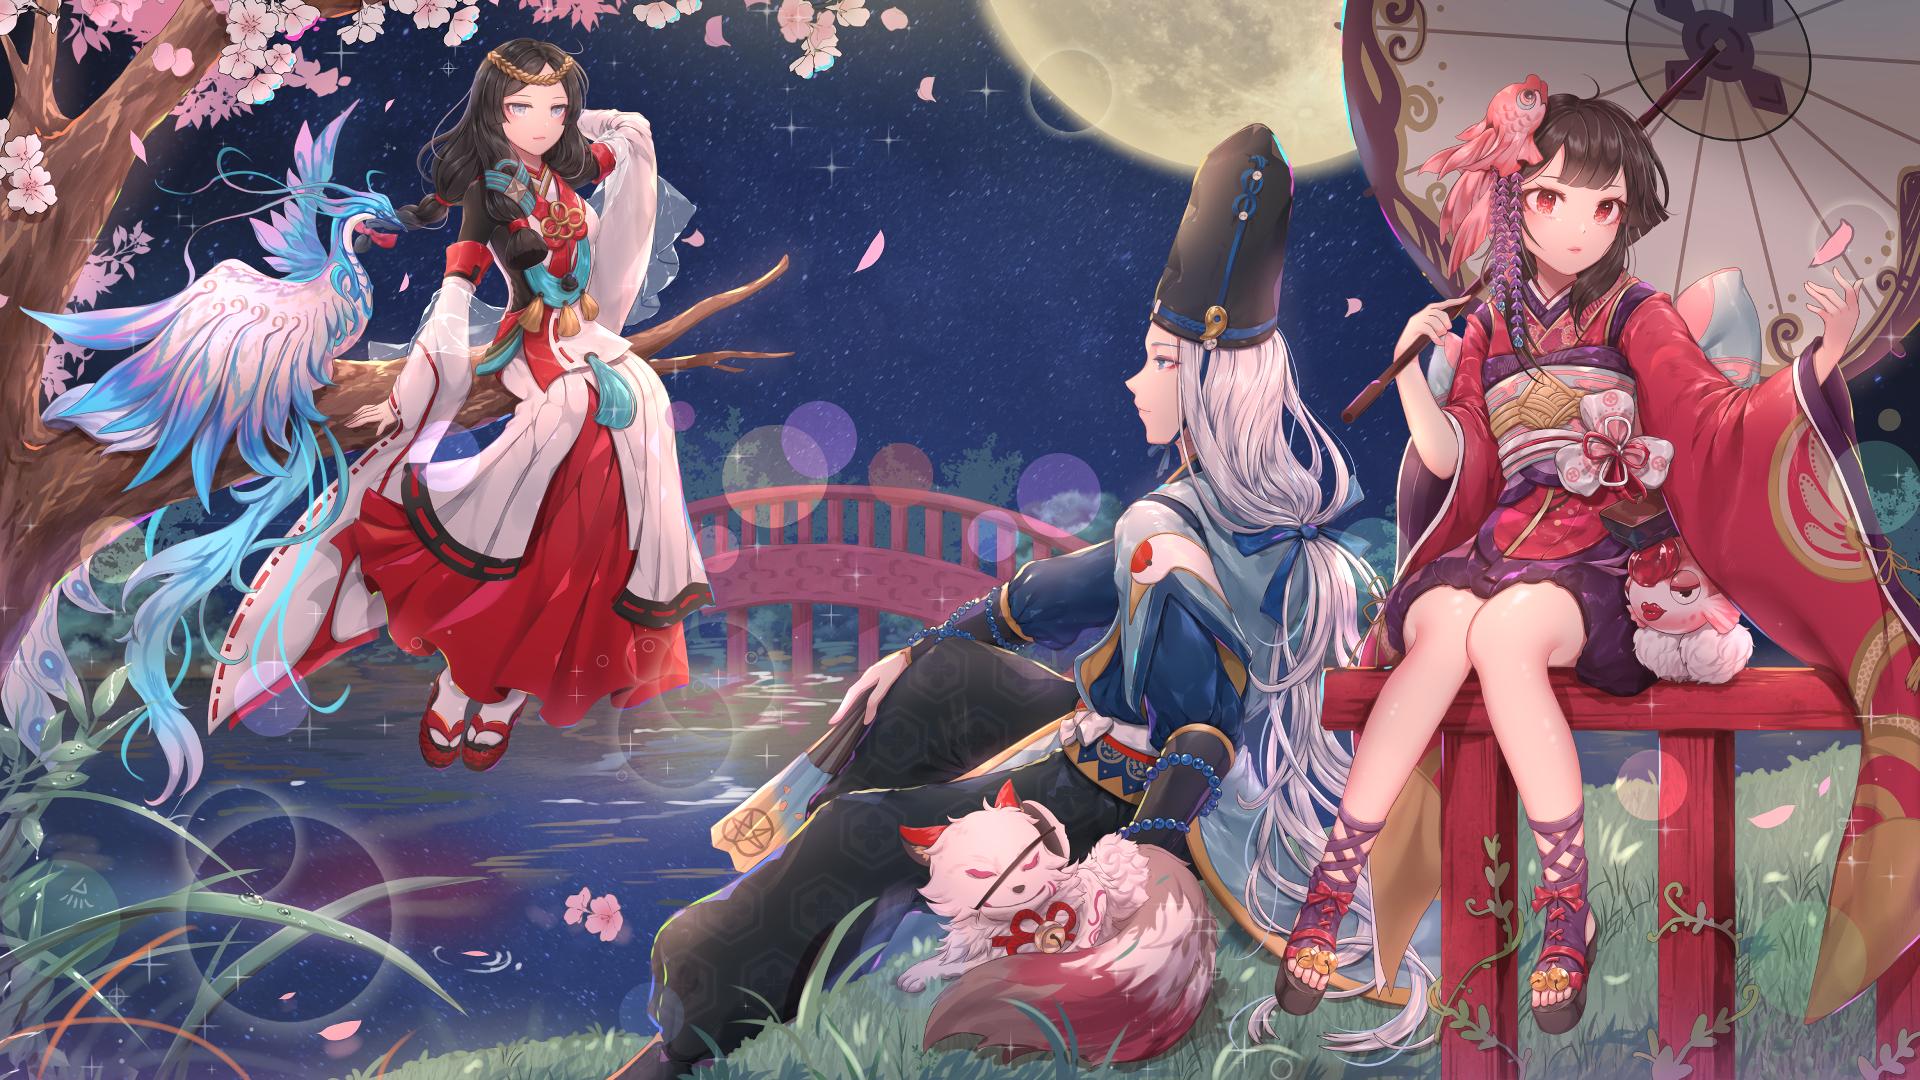 Onmyouji A Sub Gallery By Ryuzu Wallpaper Abyss